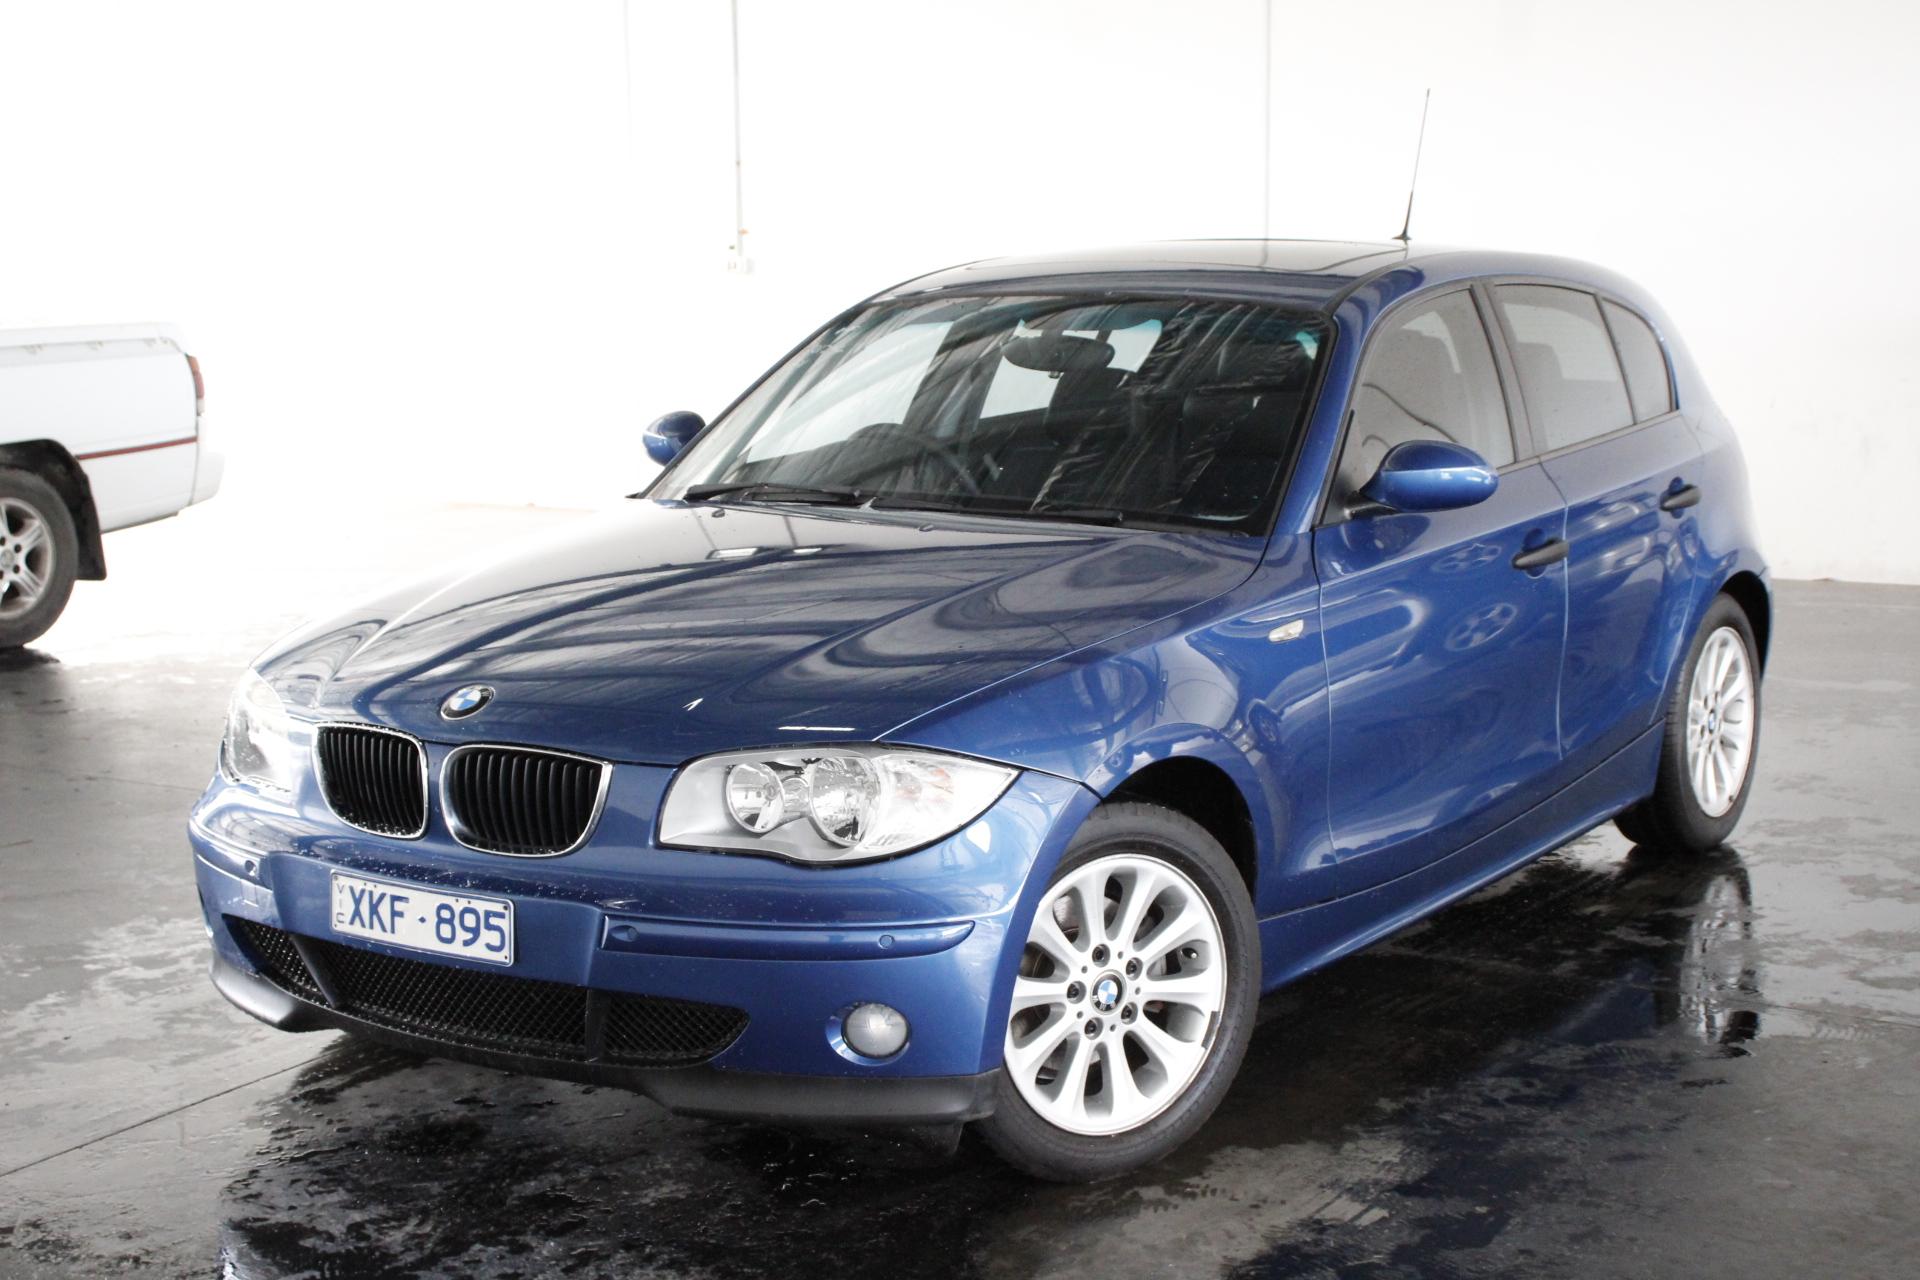 2005 BMW 1 18i E87 Automatic Hatchback